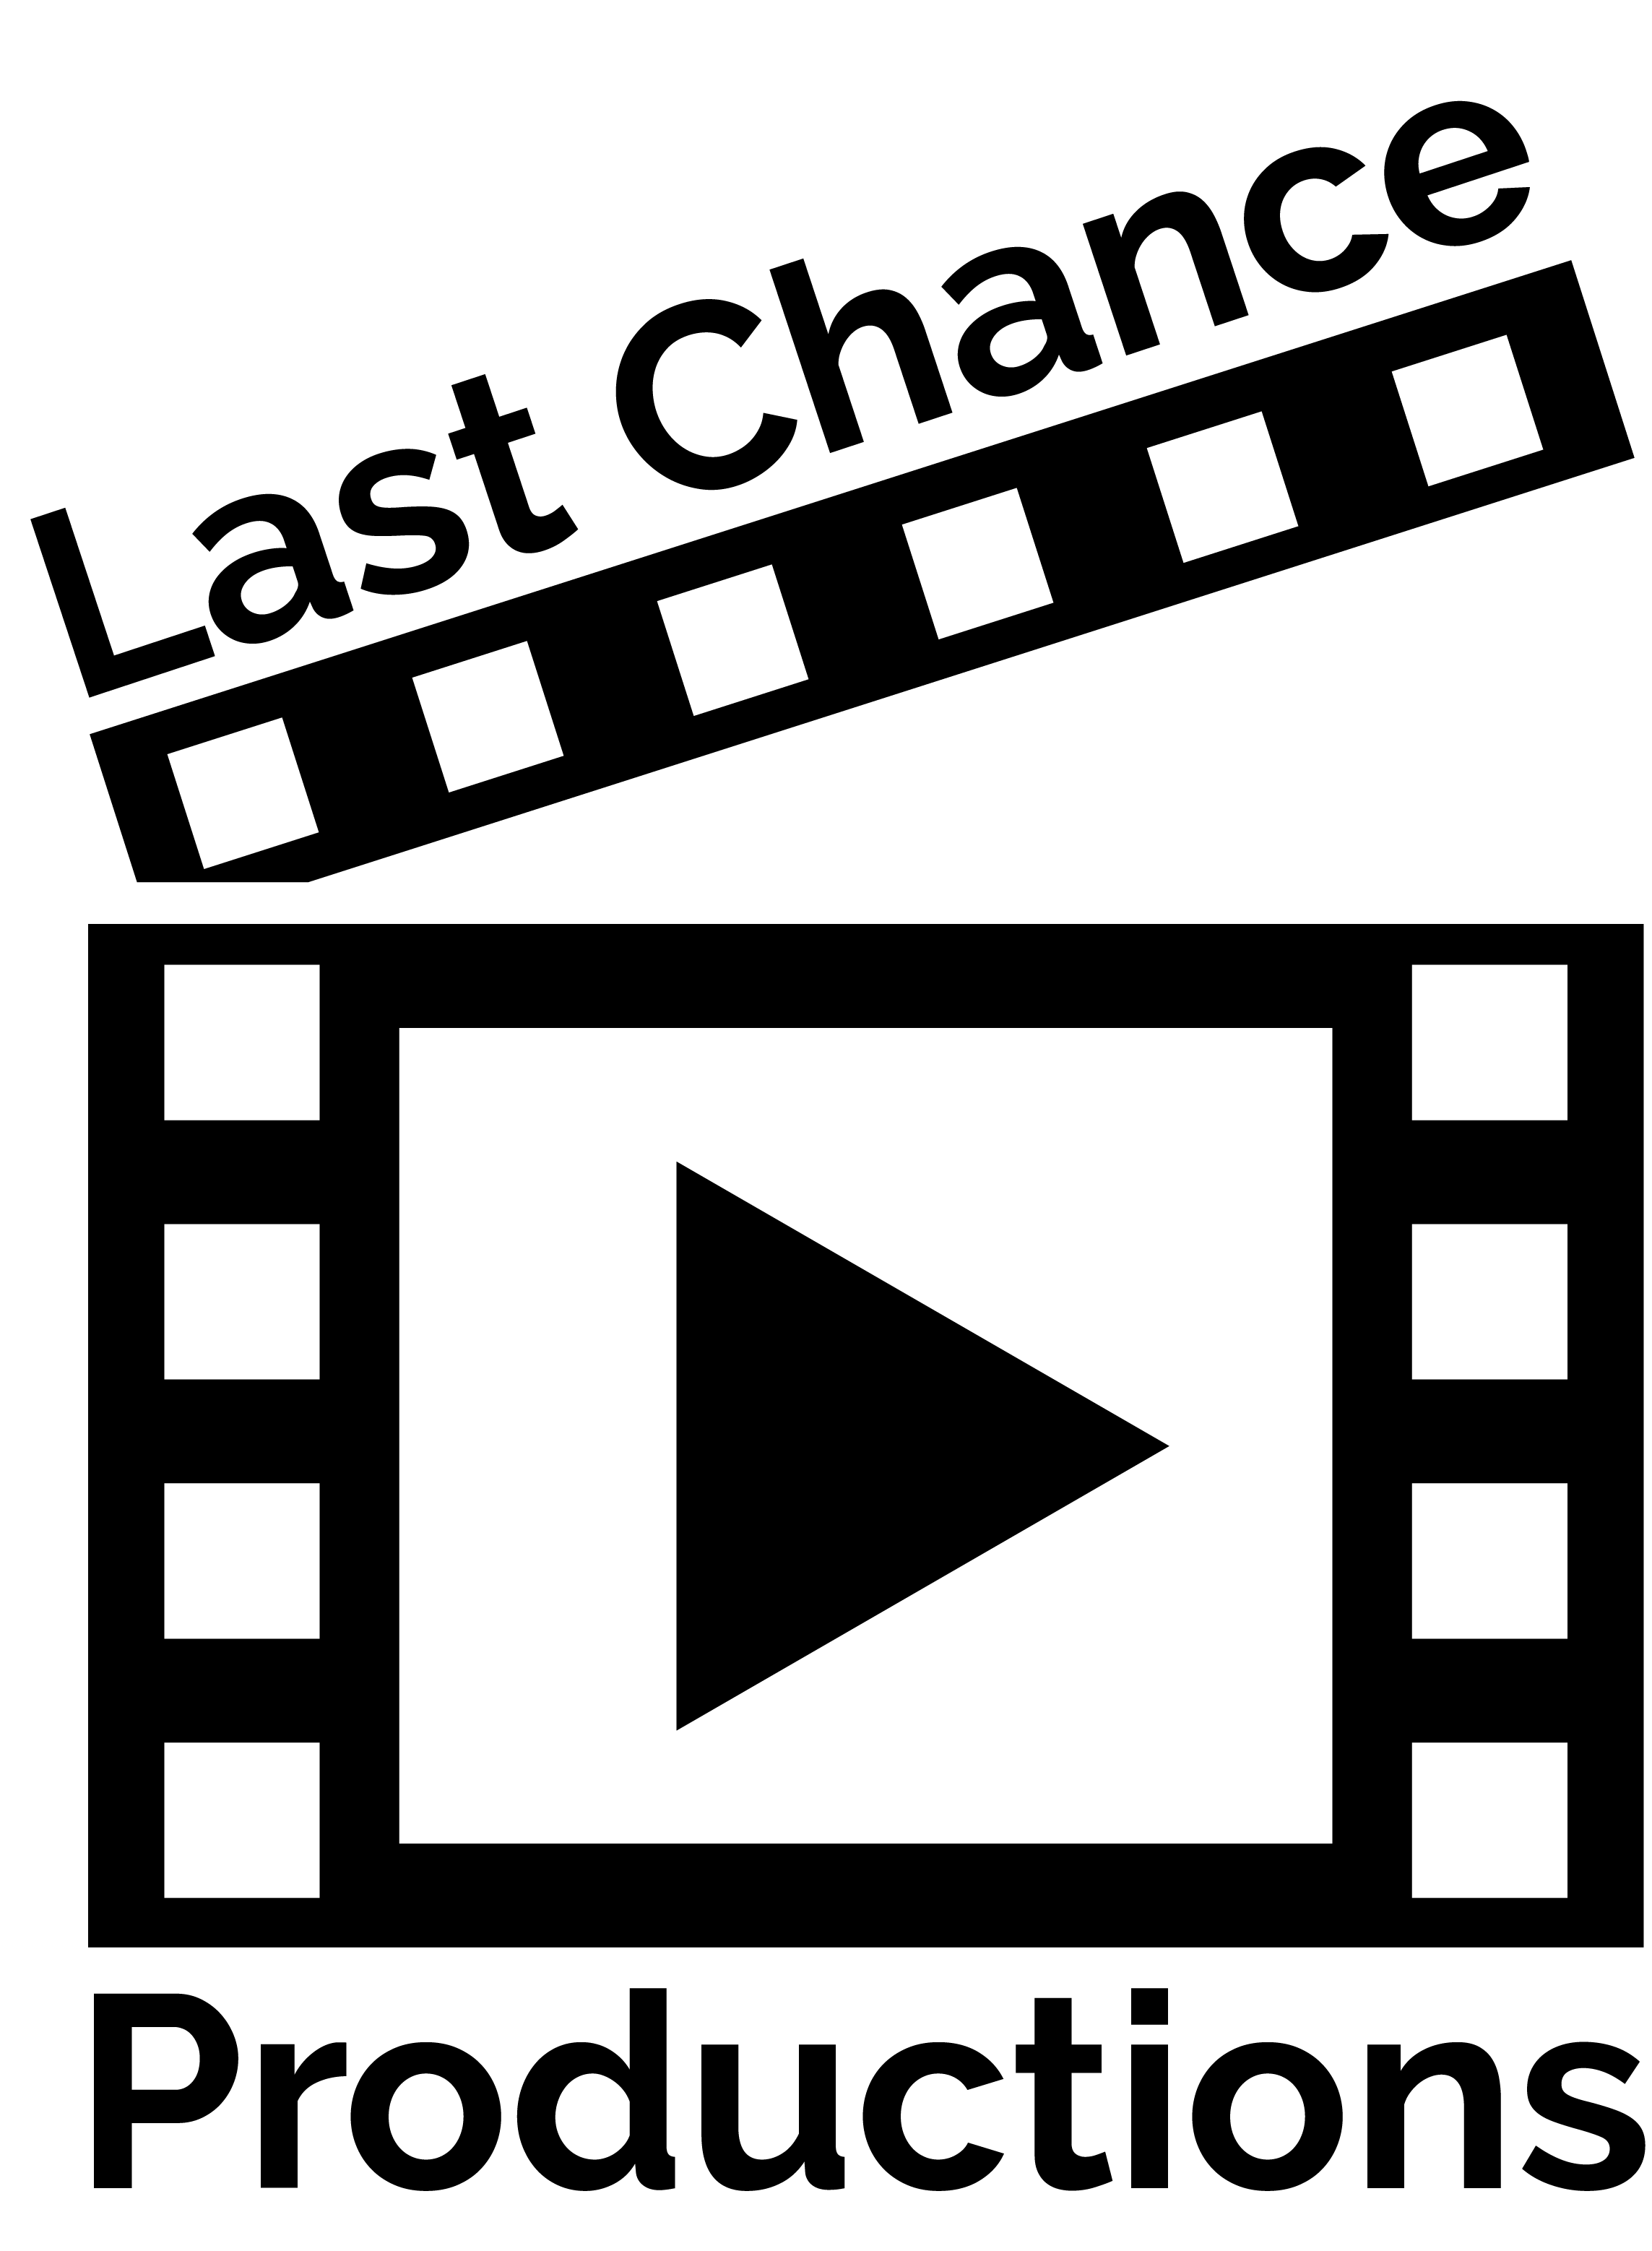 Last Chance Productions logo